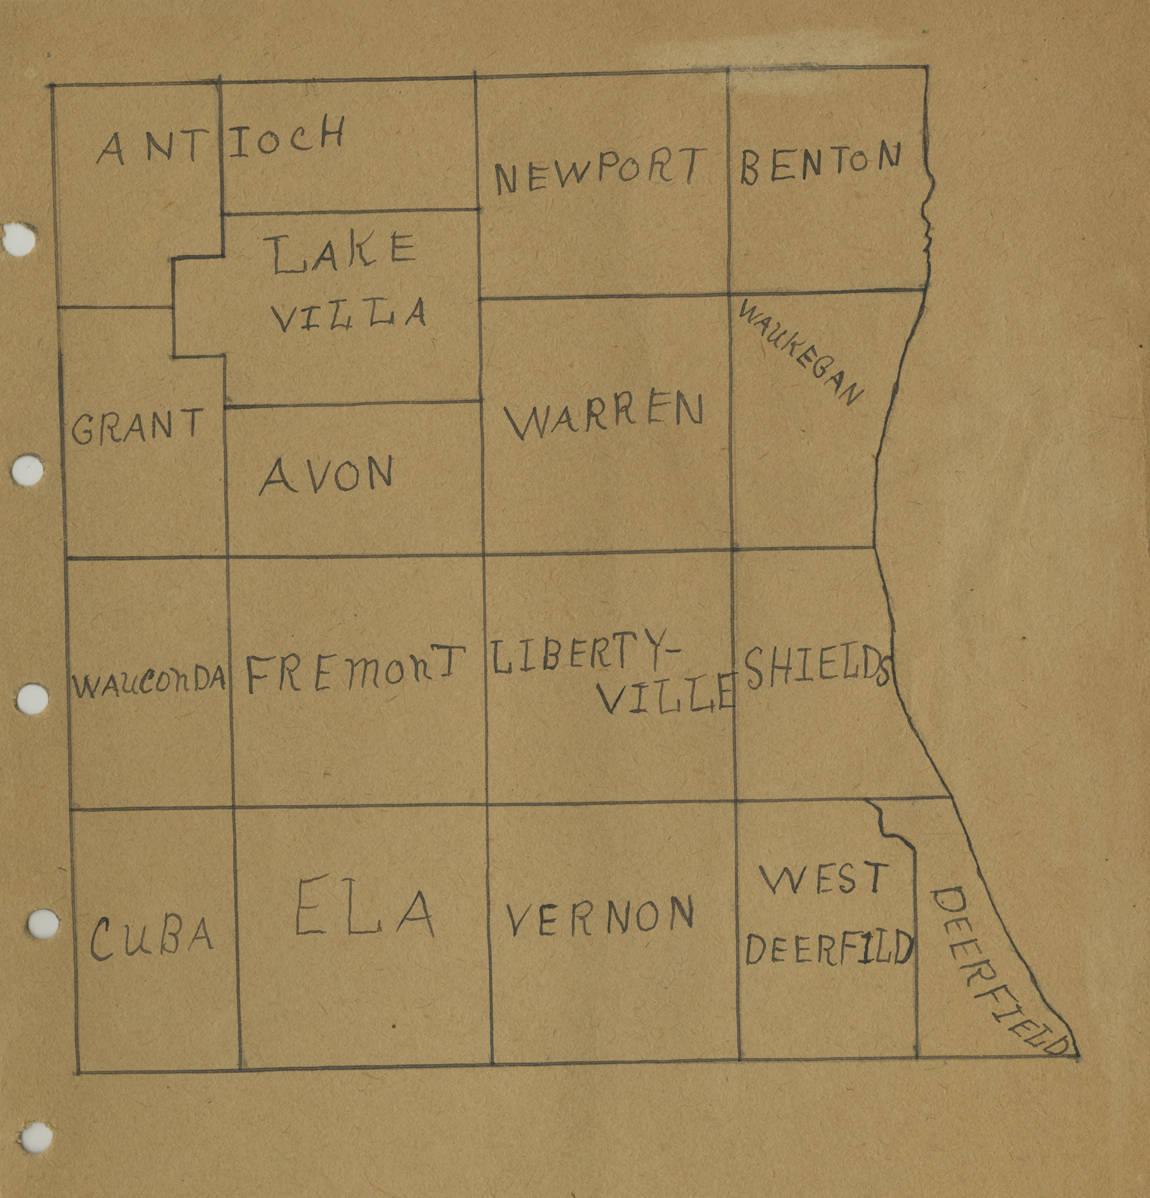 C:\Users\Vern\Documents\Fort Hill\1918 Schools Centennial\1918 Wauconda Twp Glynch School\1918_School_Histories__Wauconda_Township__Glynch_School_2003045_Page_4.jpg